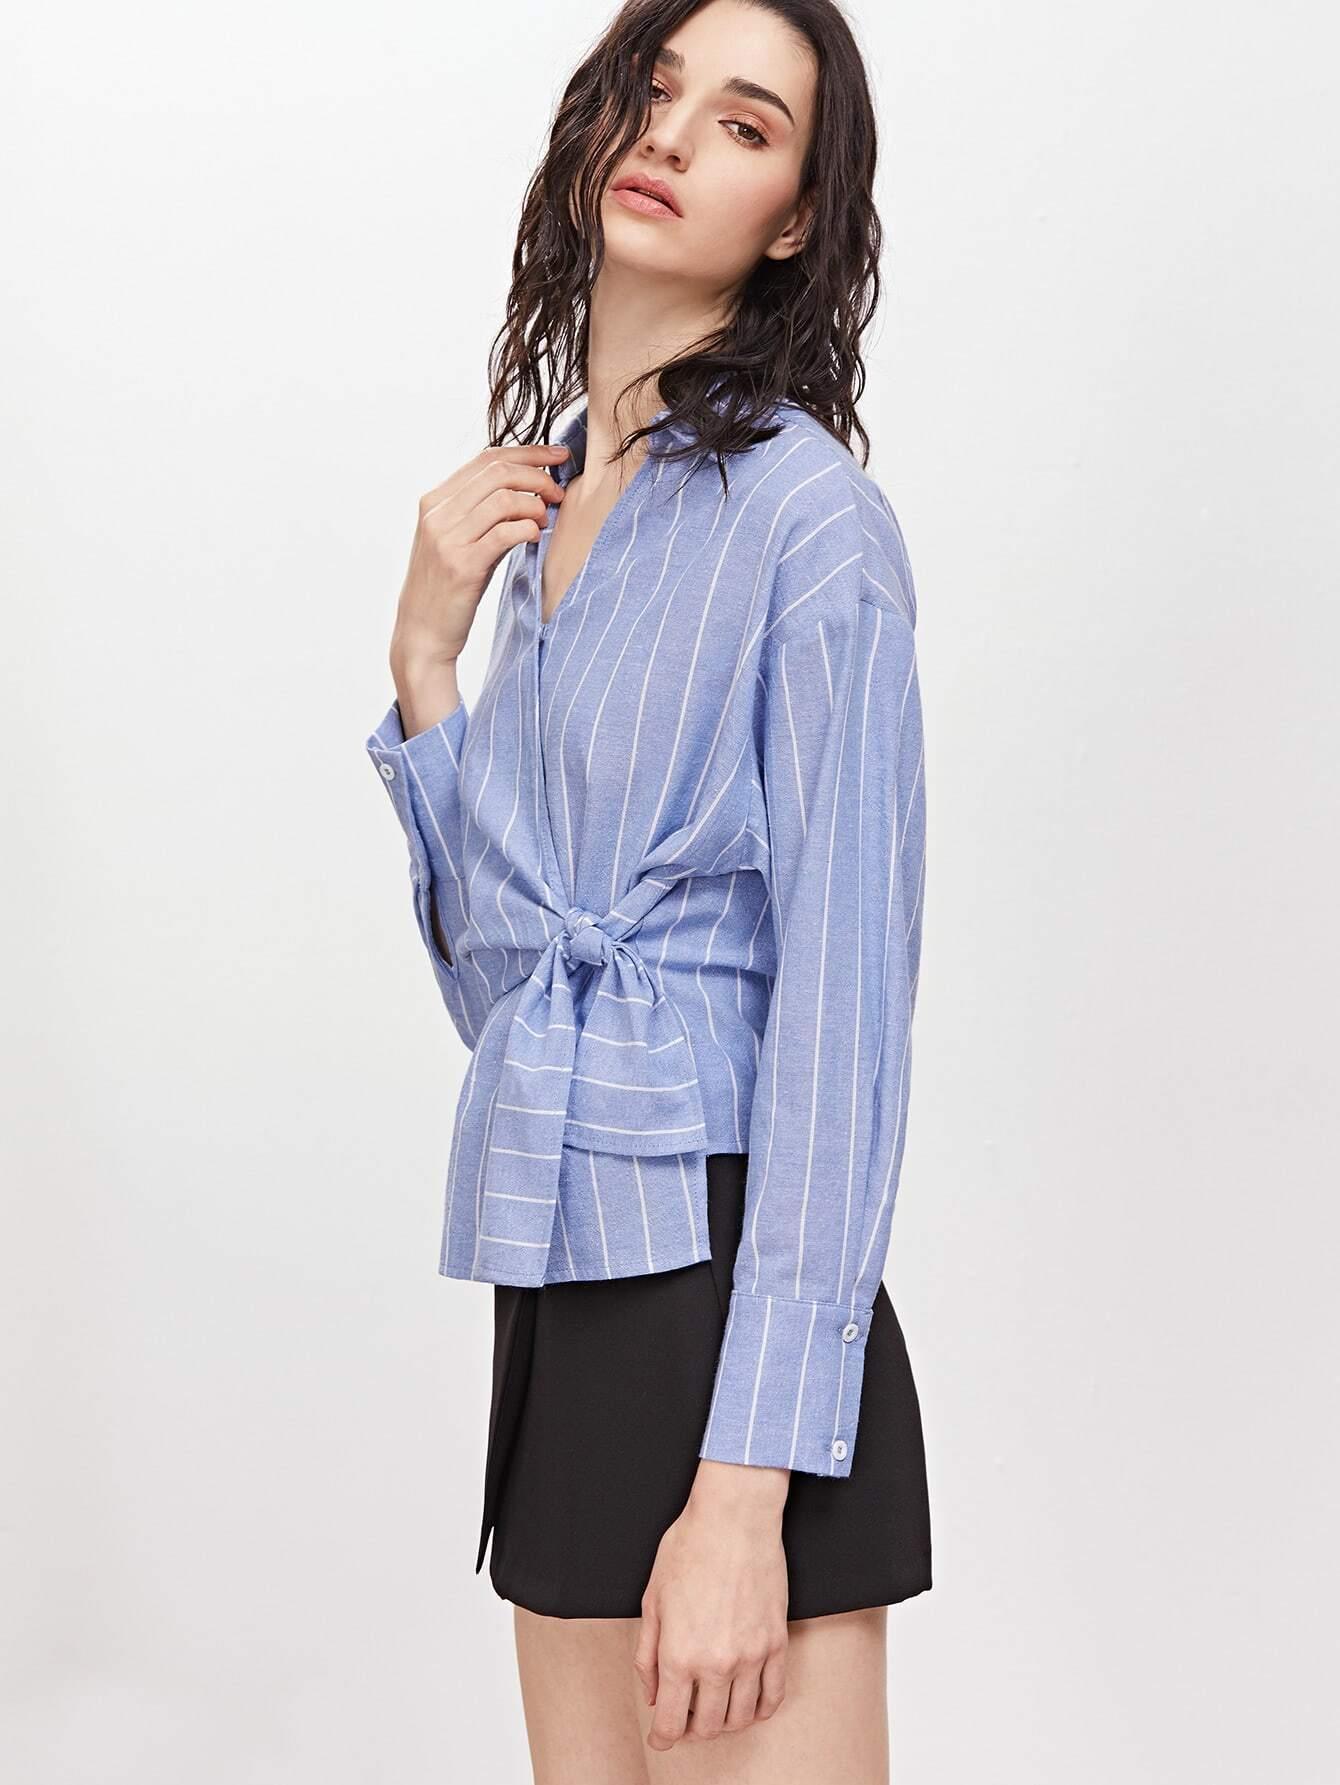 blouse161223711_2